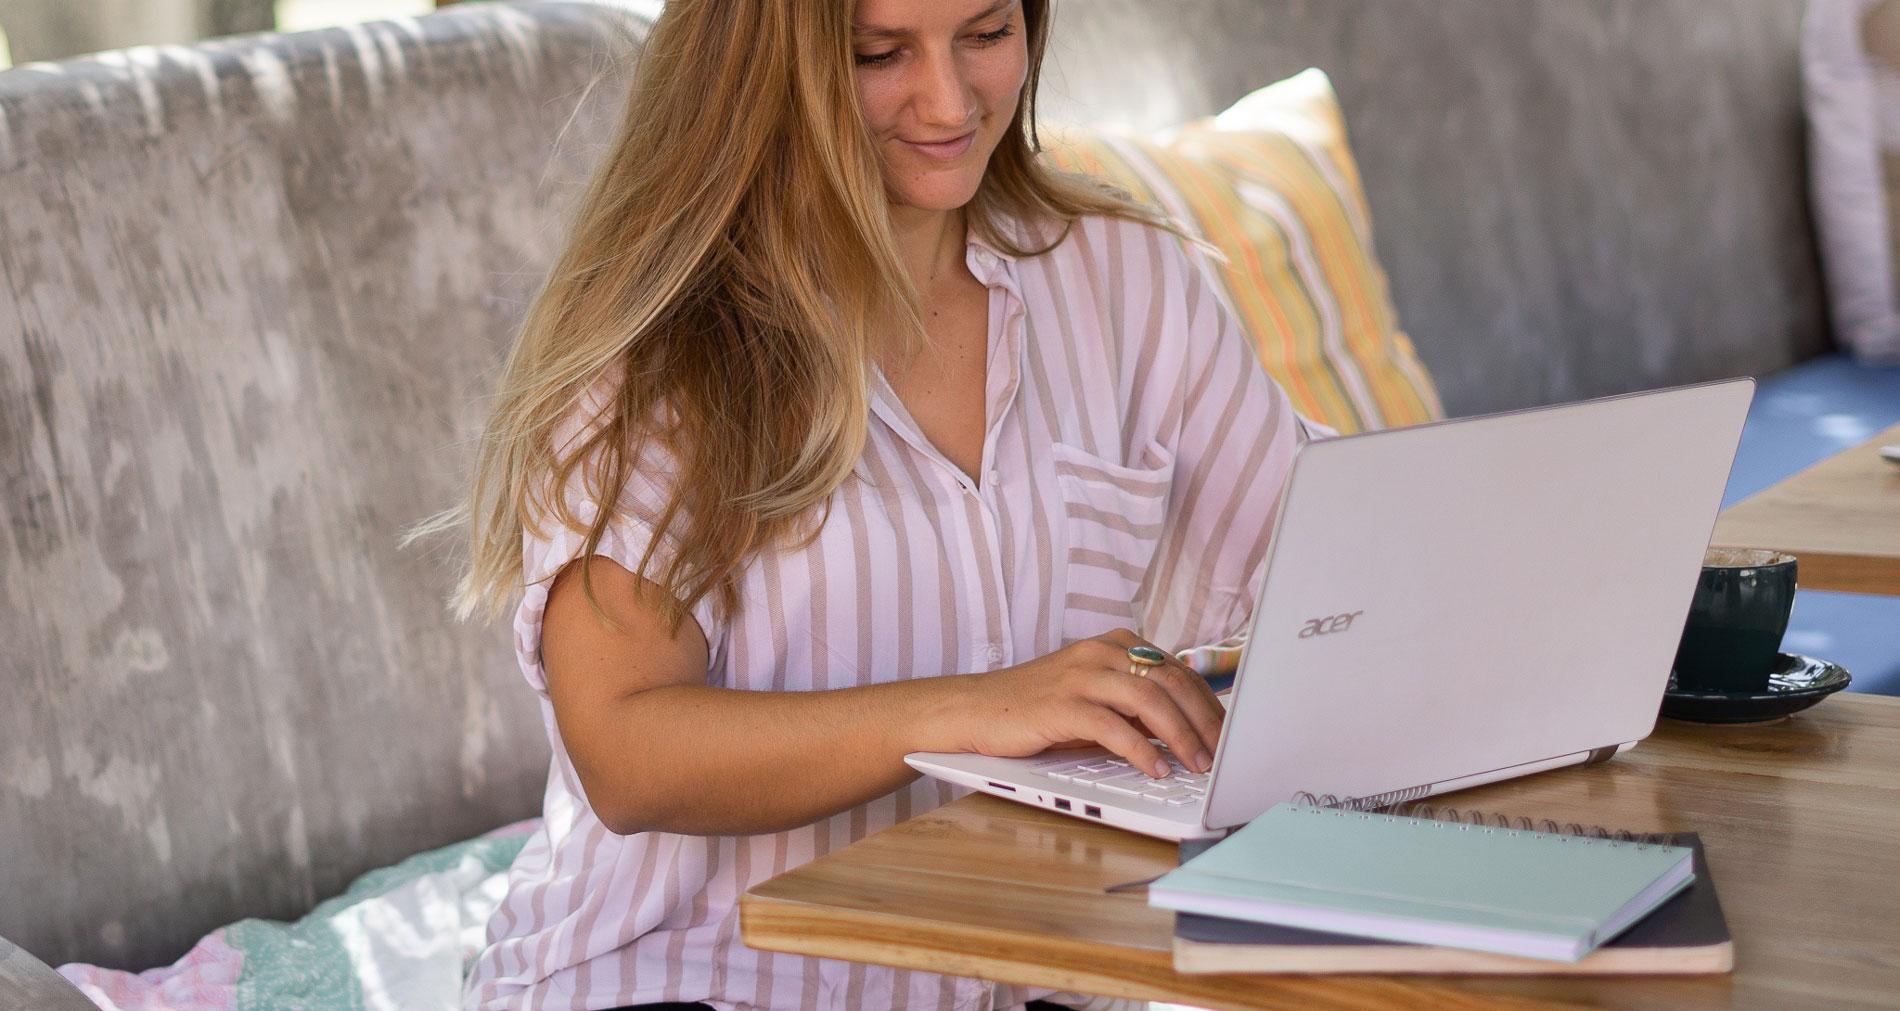 Freelance-Texter und Autorin Inga Maria Panten